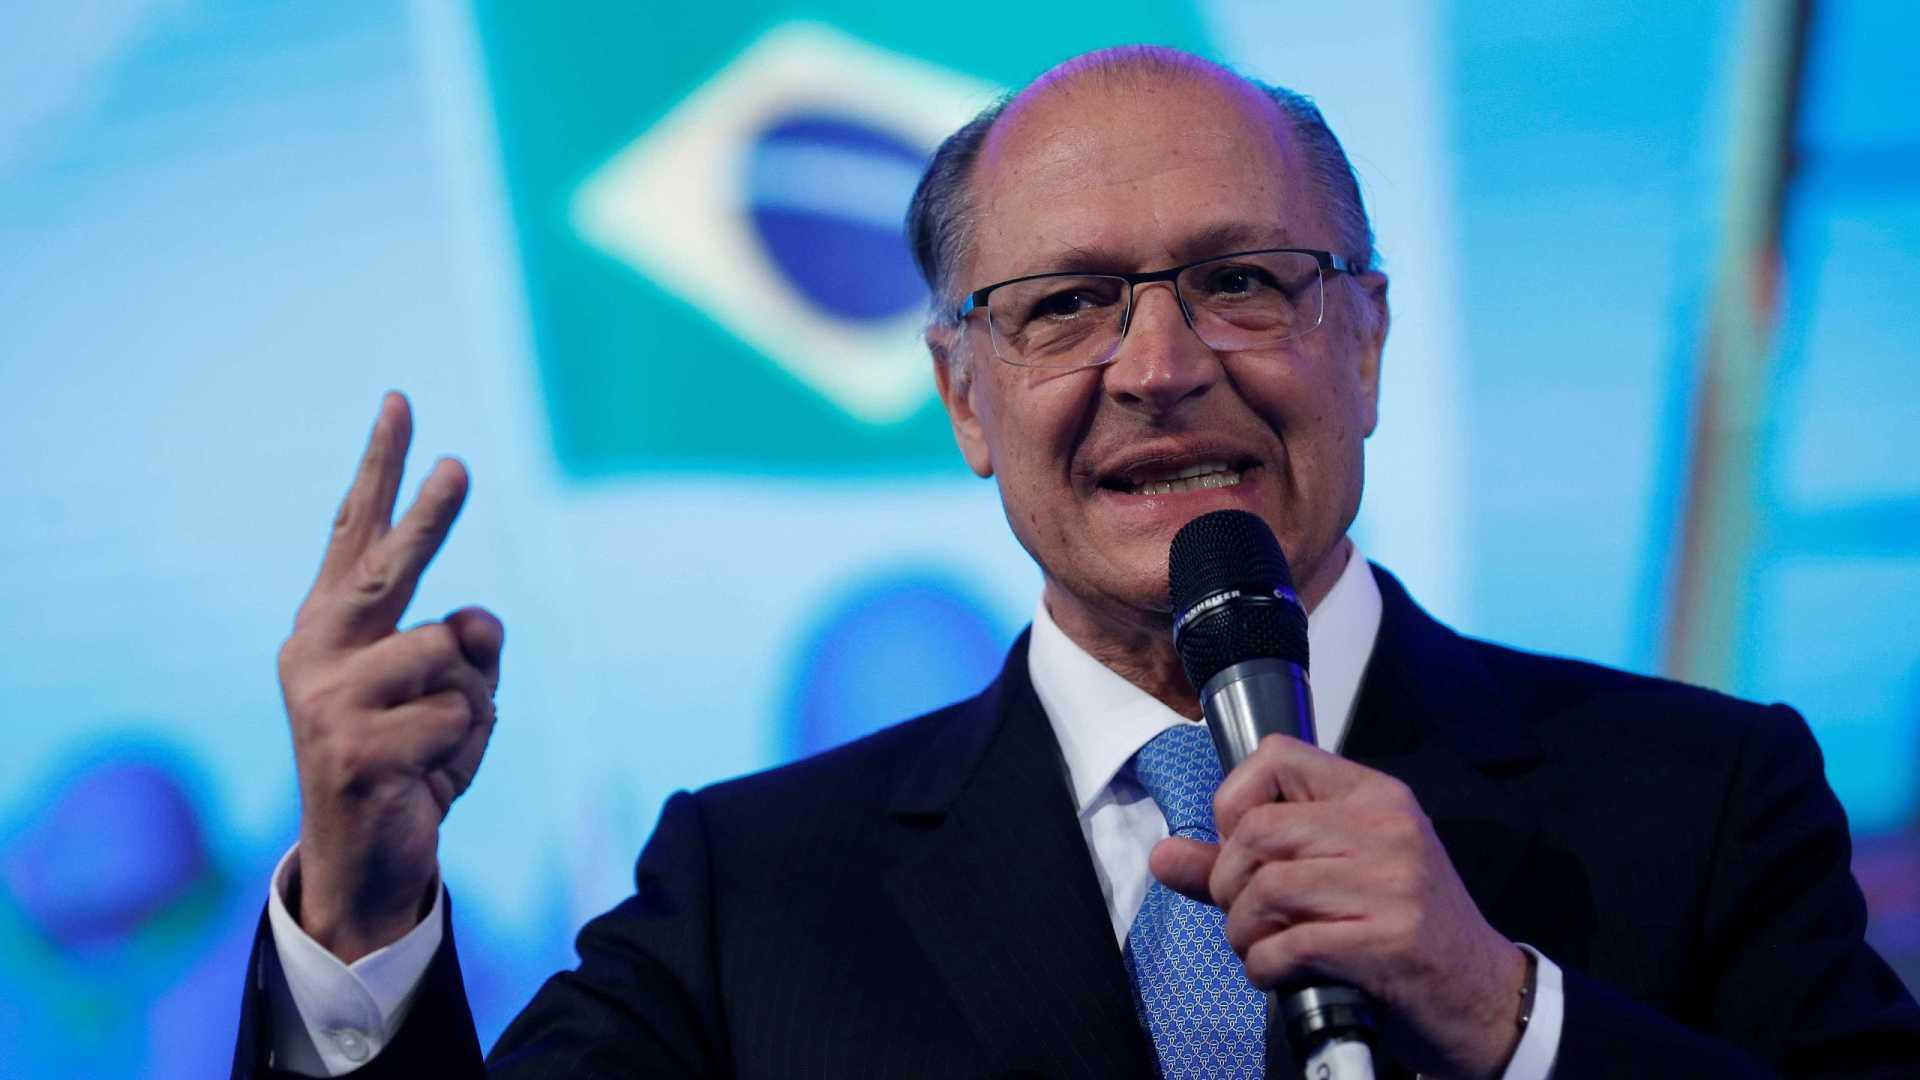 Ministério Público SP abre inquérito para investigar Geraldo Alckmin